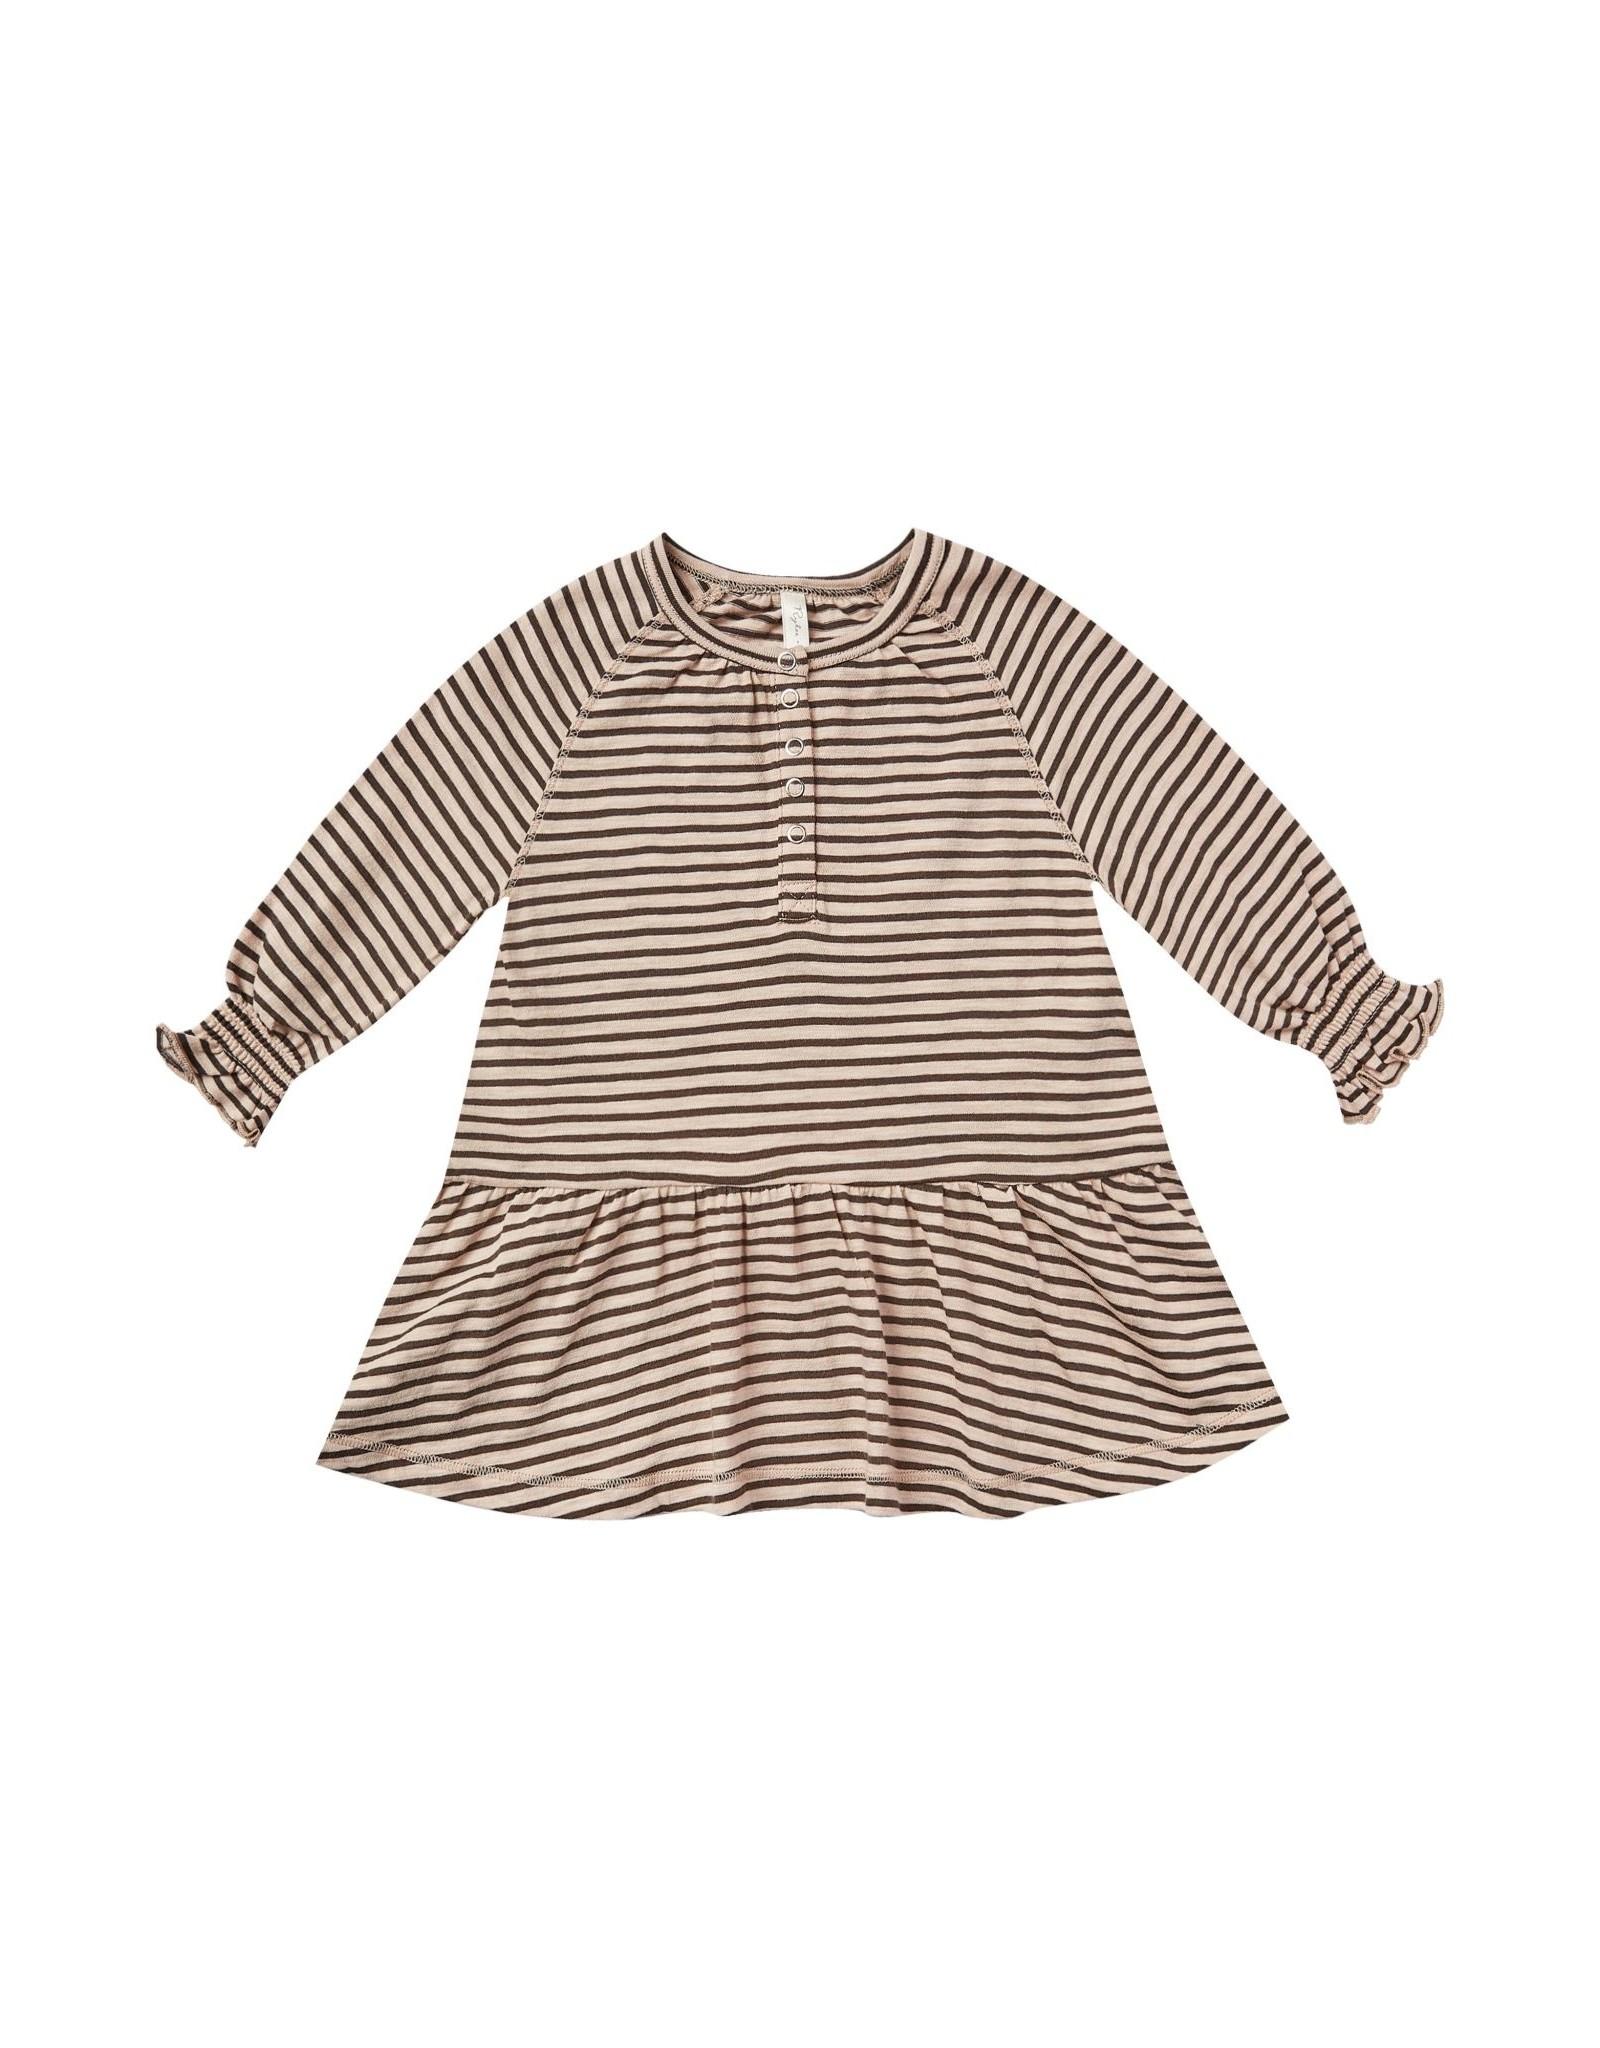 Rylee and Cru stripe swing dress